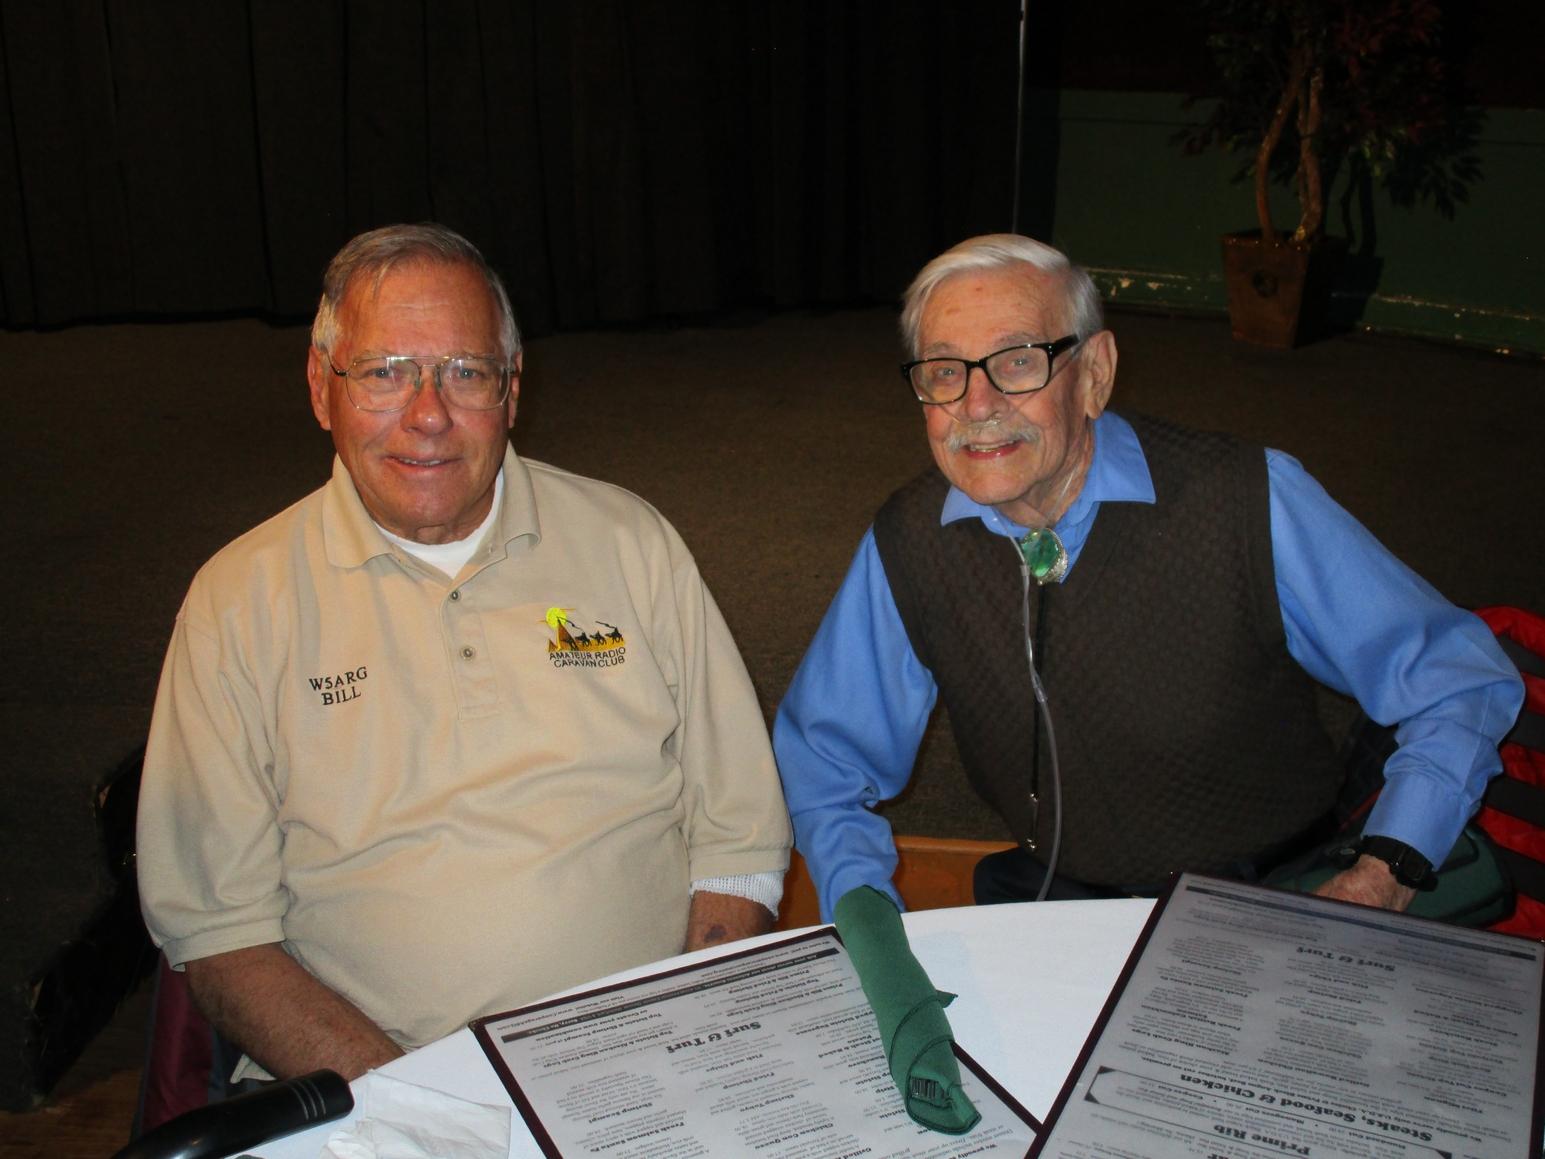 Bill K5ARG & Don K5BIS